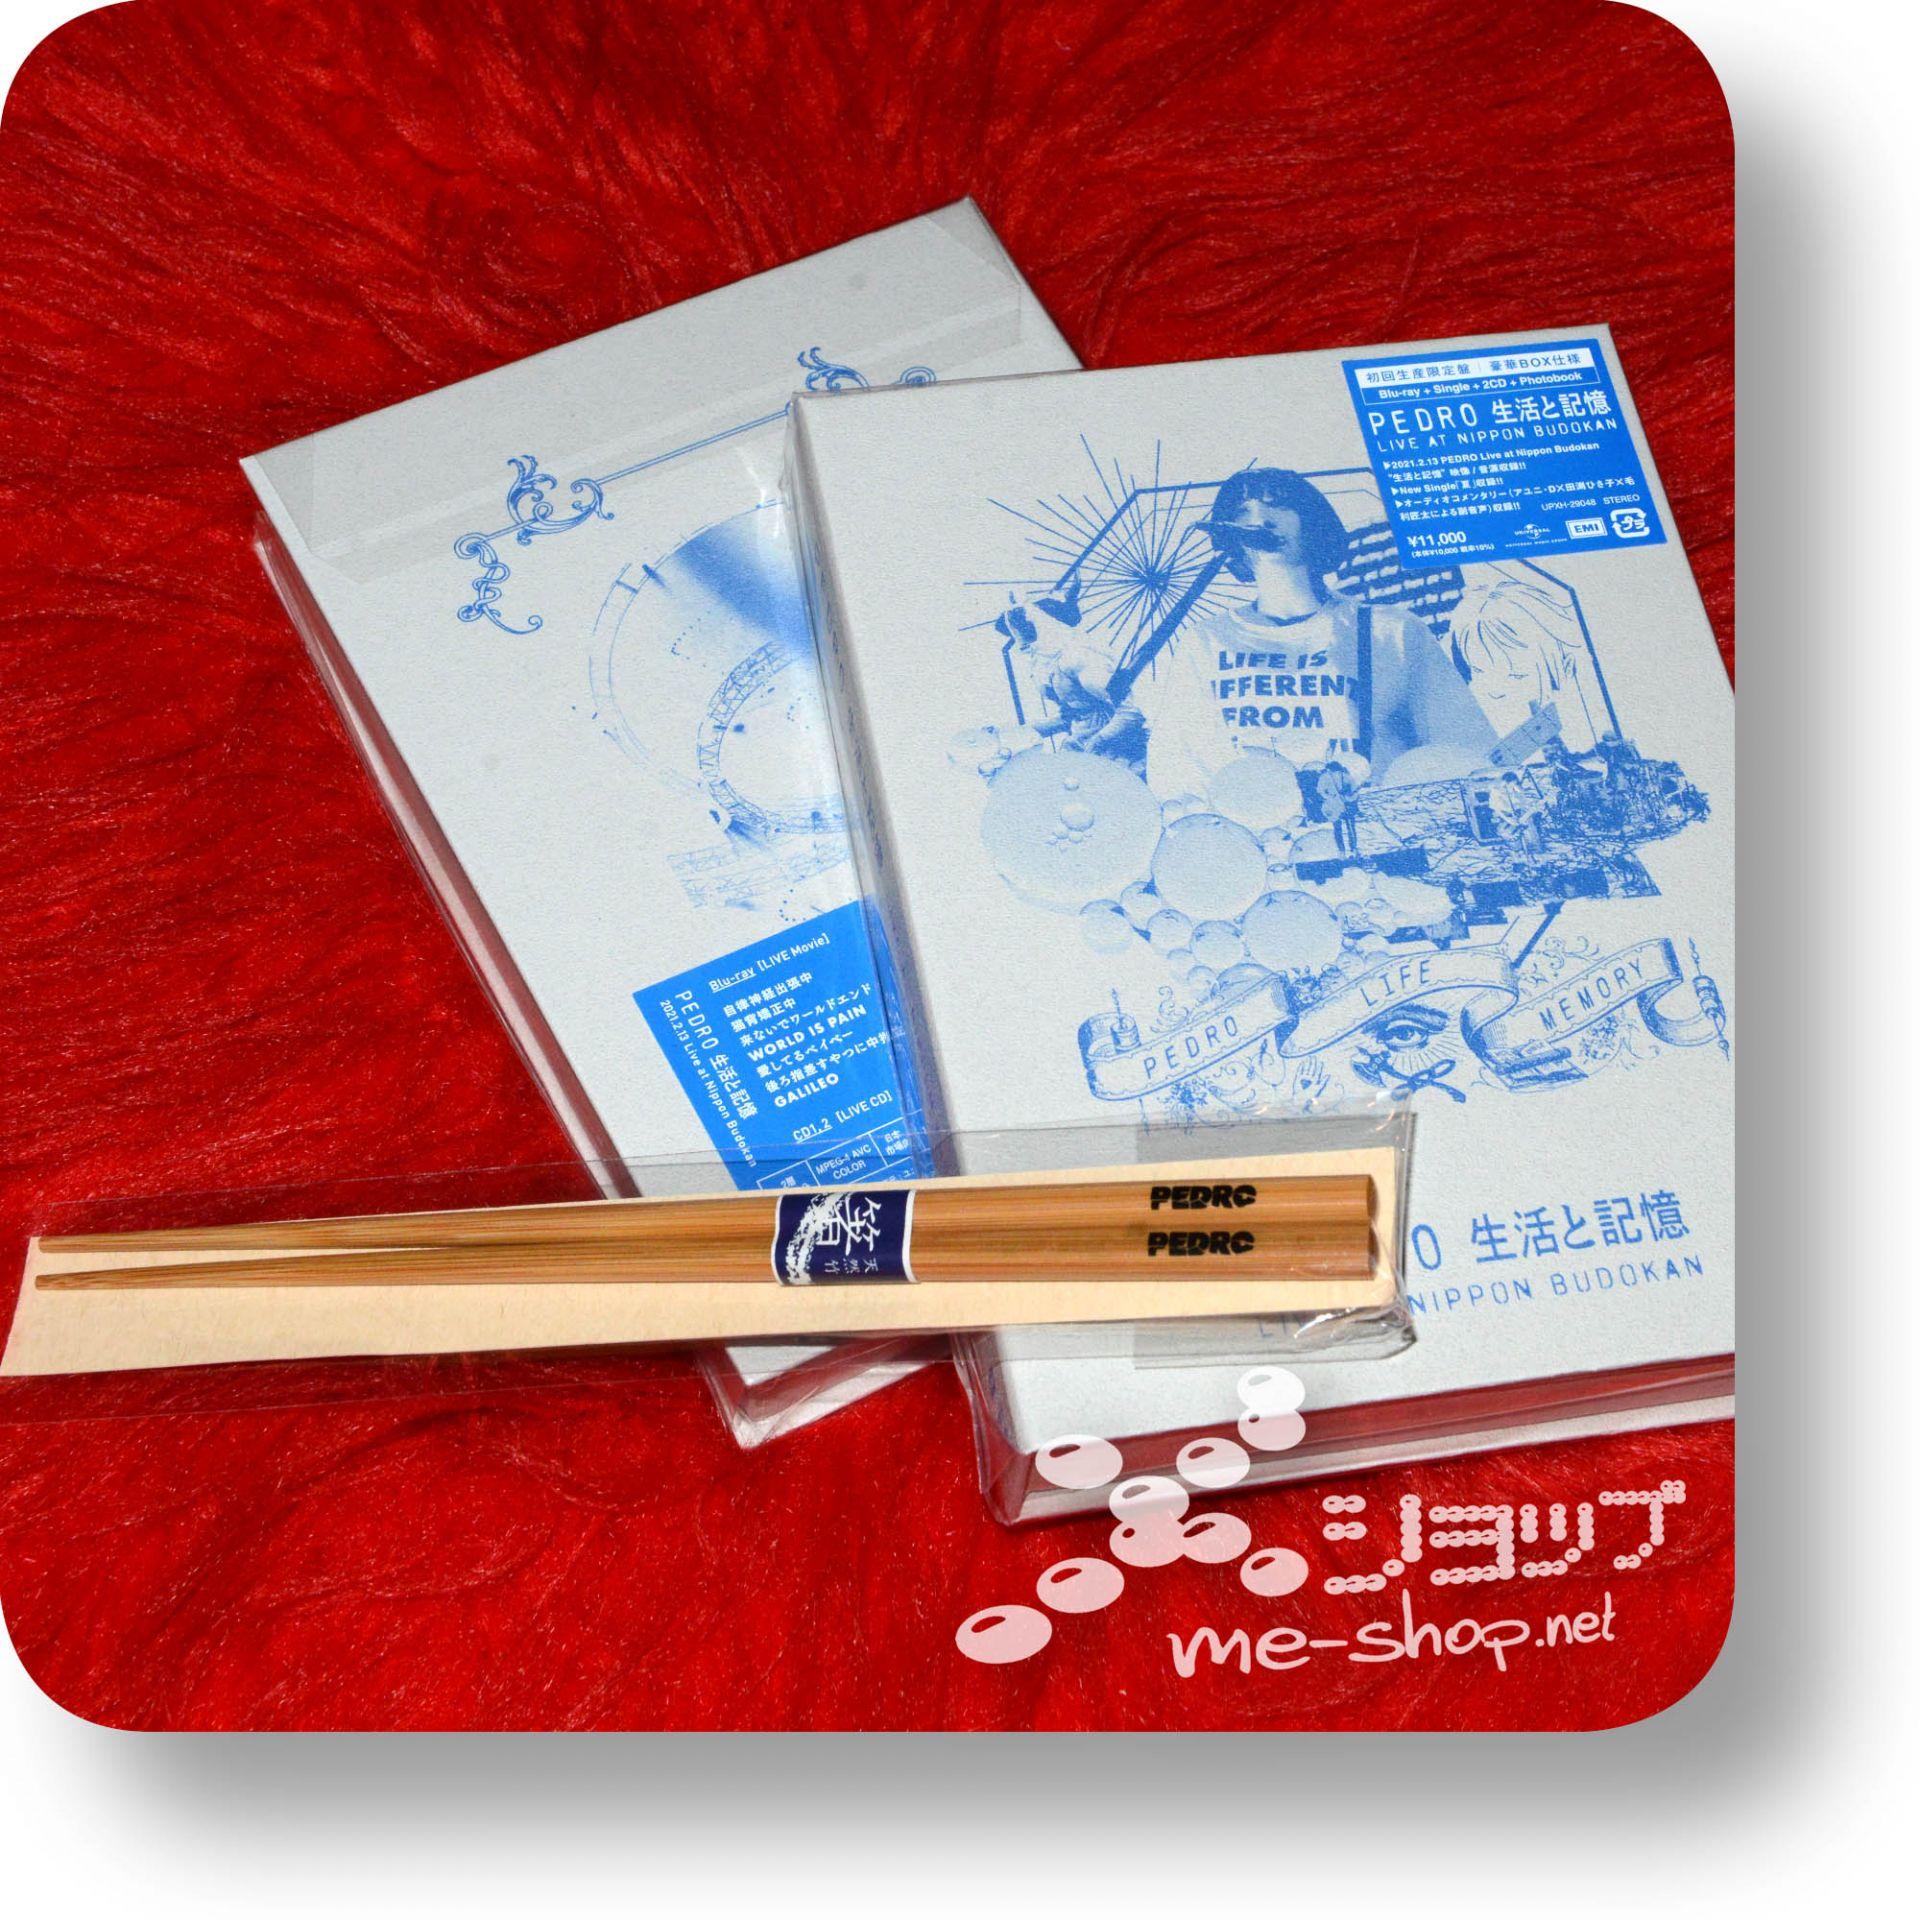 pedro live at nippon budokan box+bonus